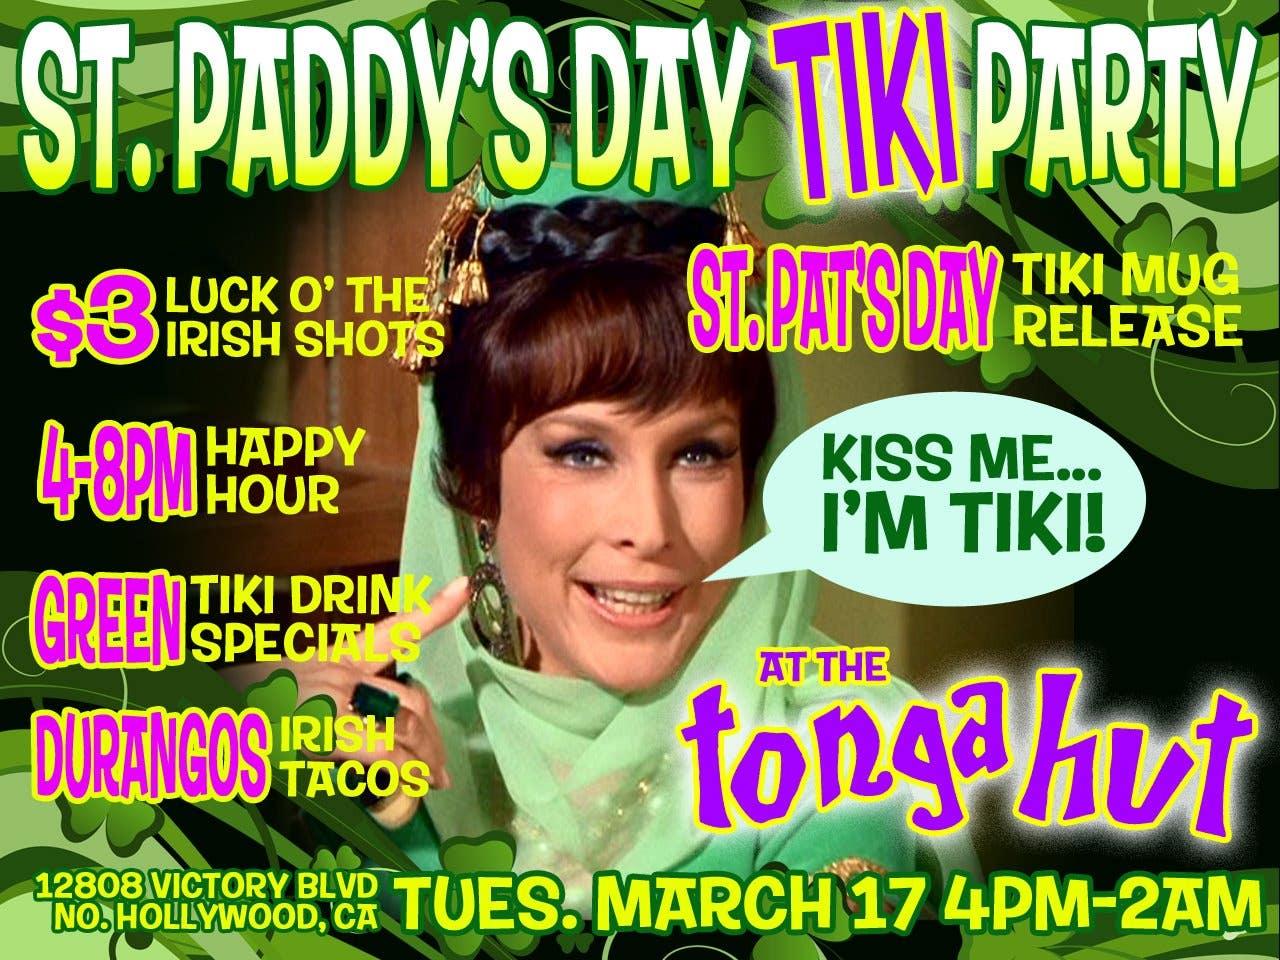 St. Paddy's Day Tiki Party at Tonga Hut